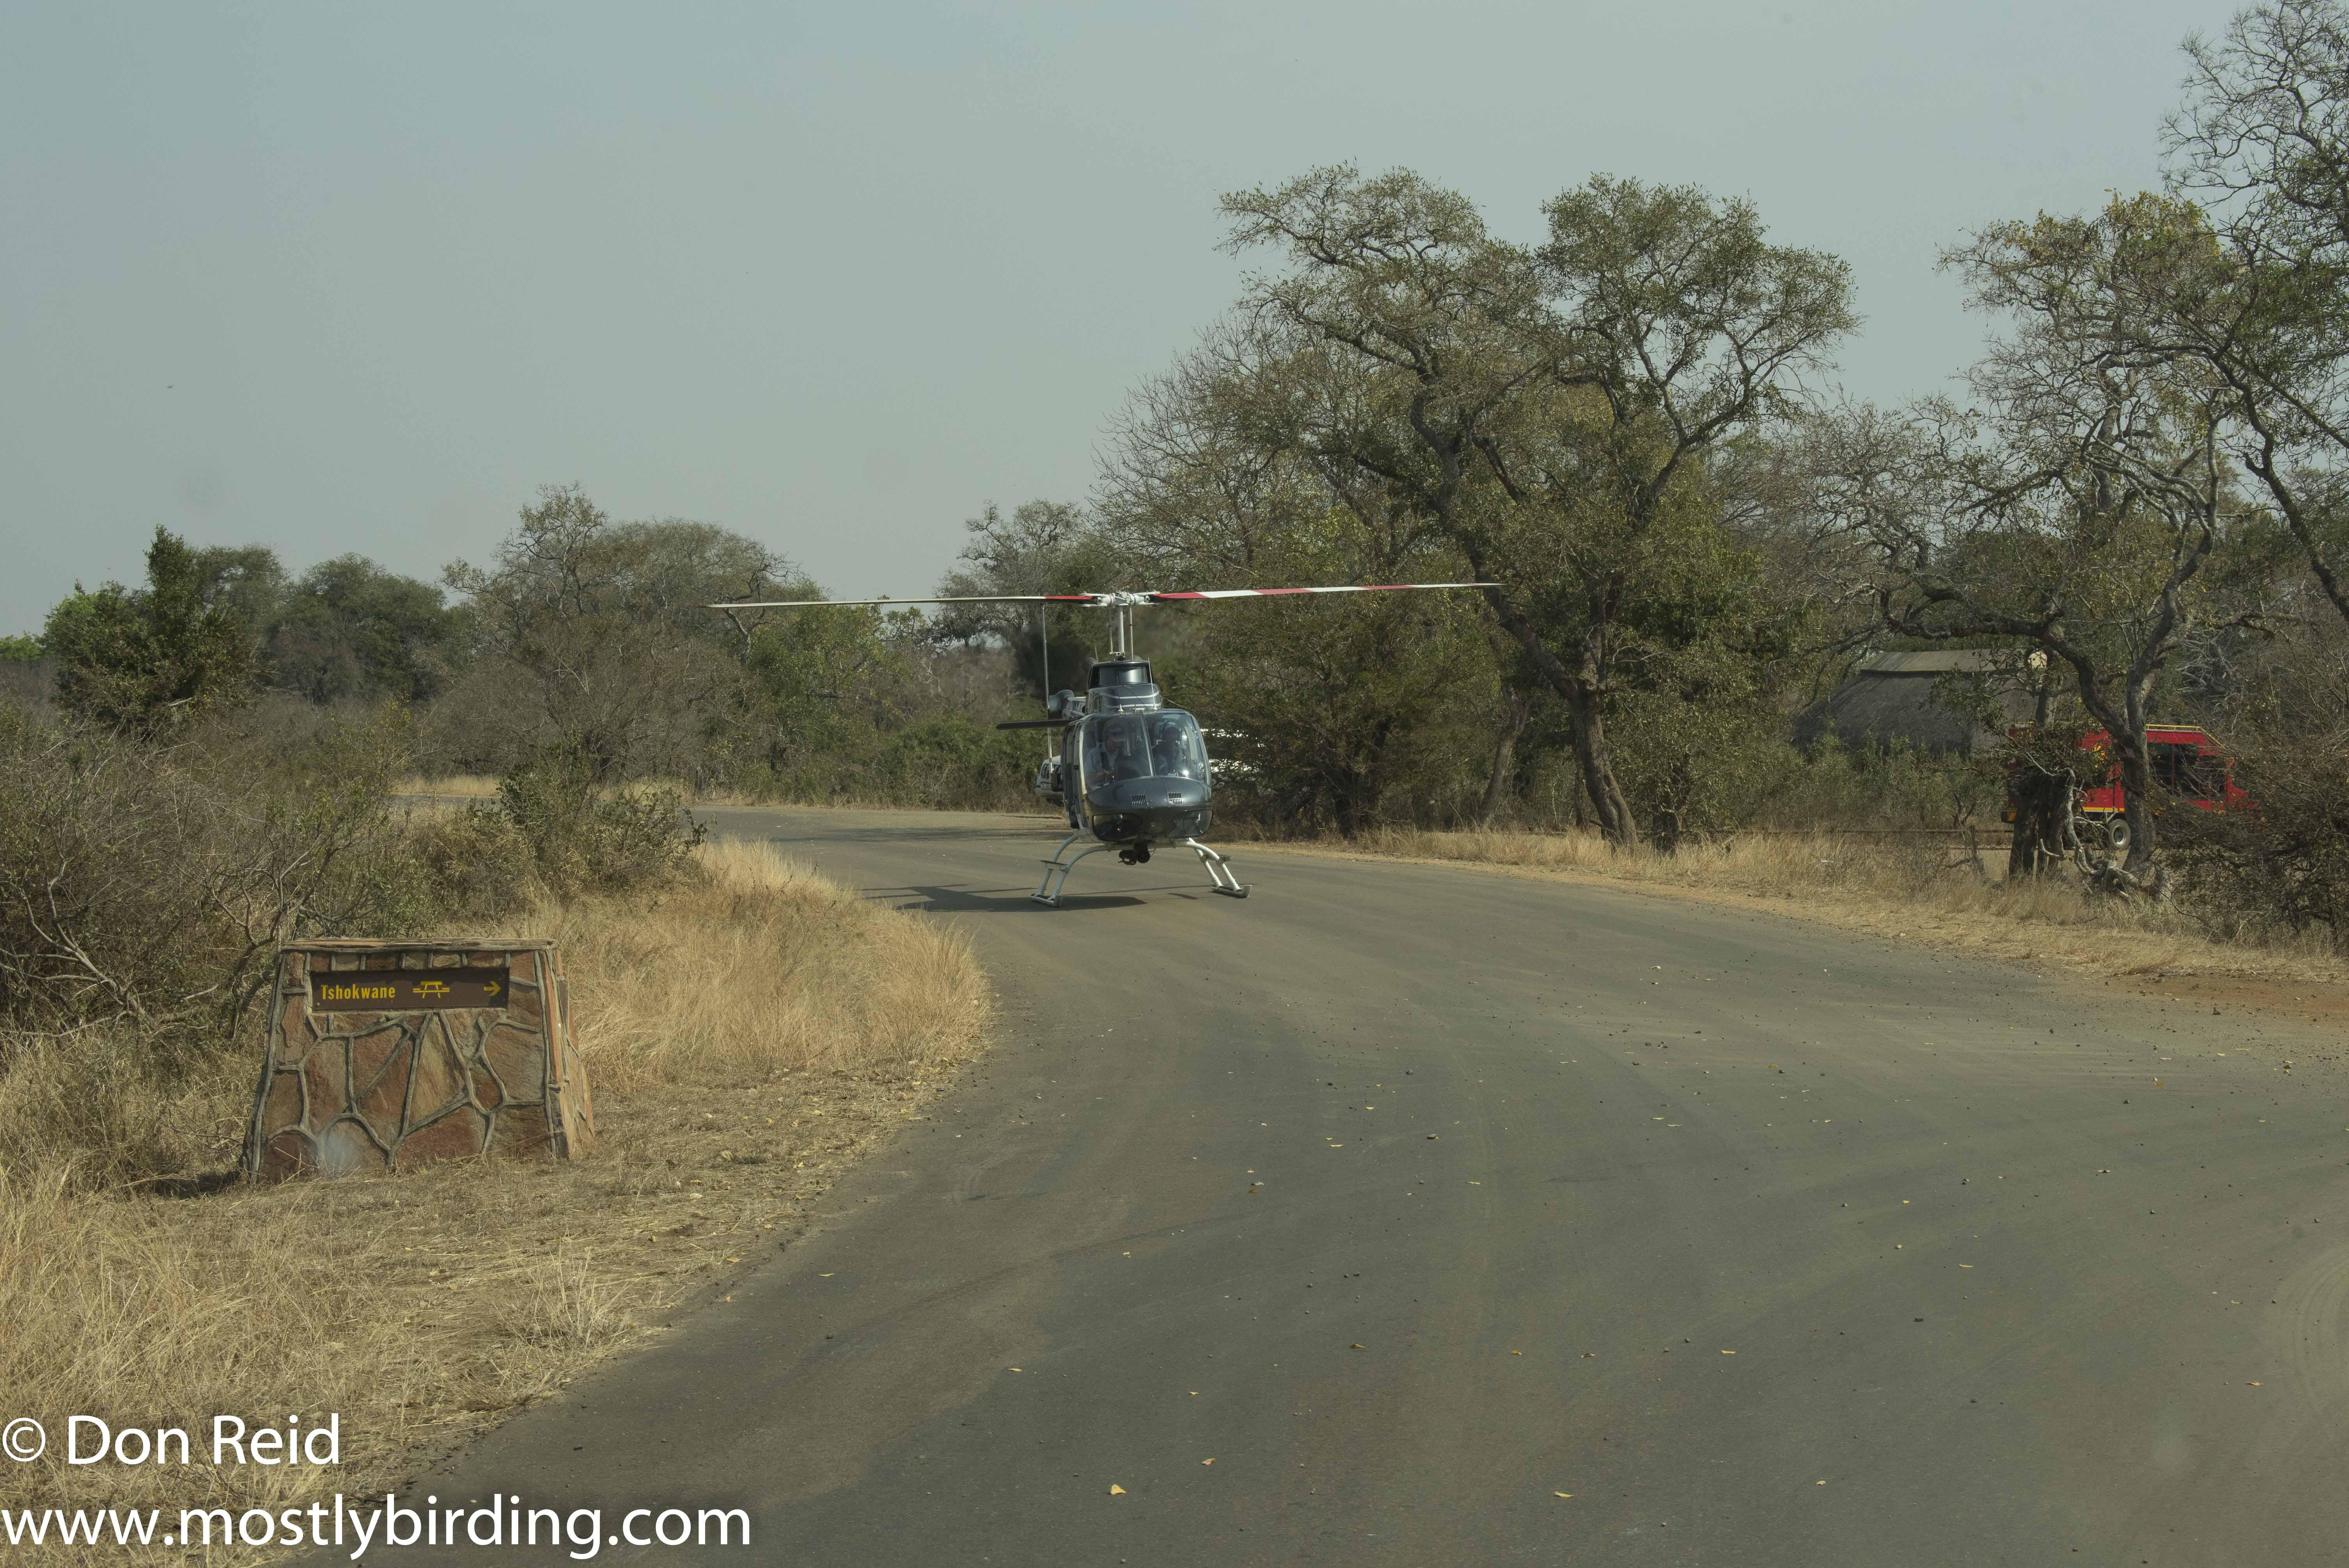 Whirly bird, Kruger Park